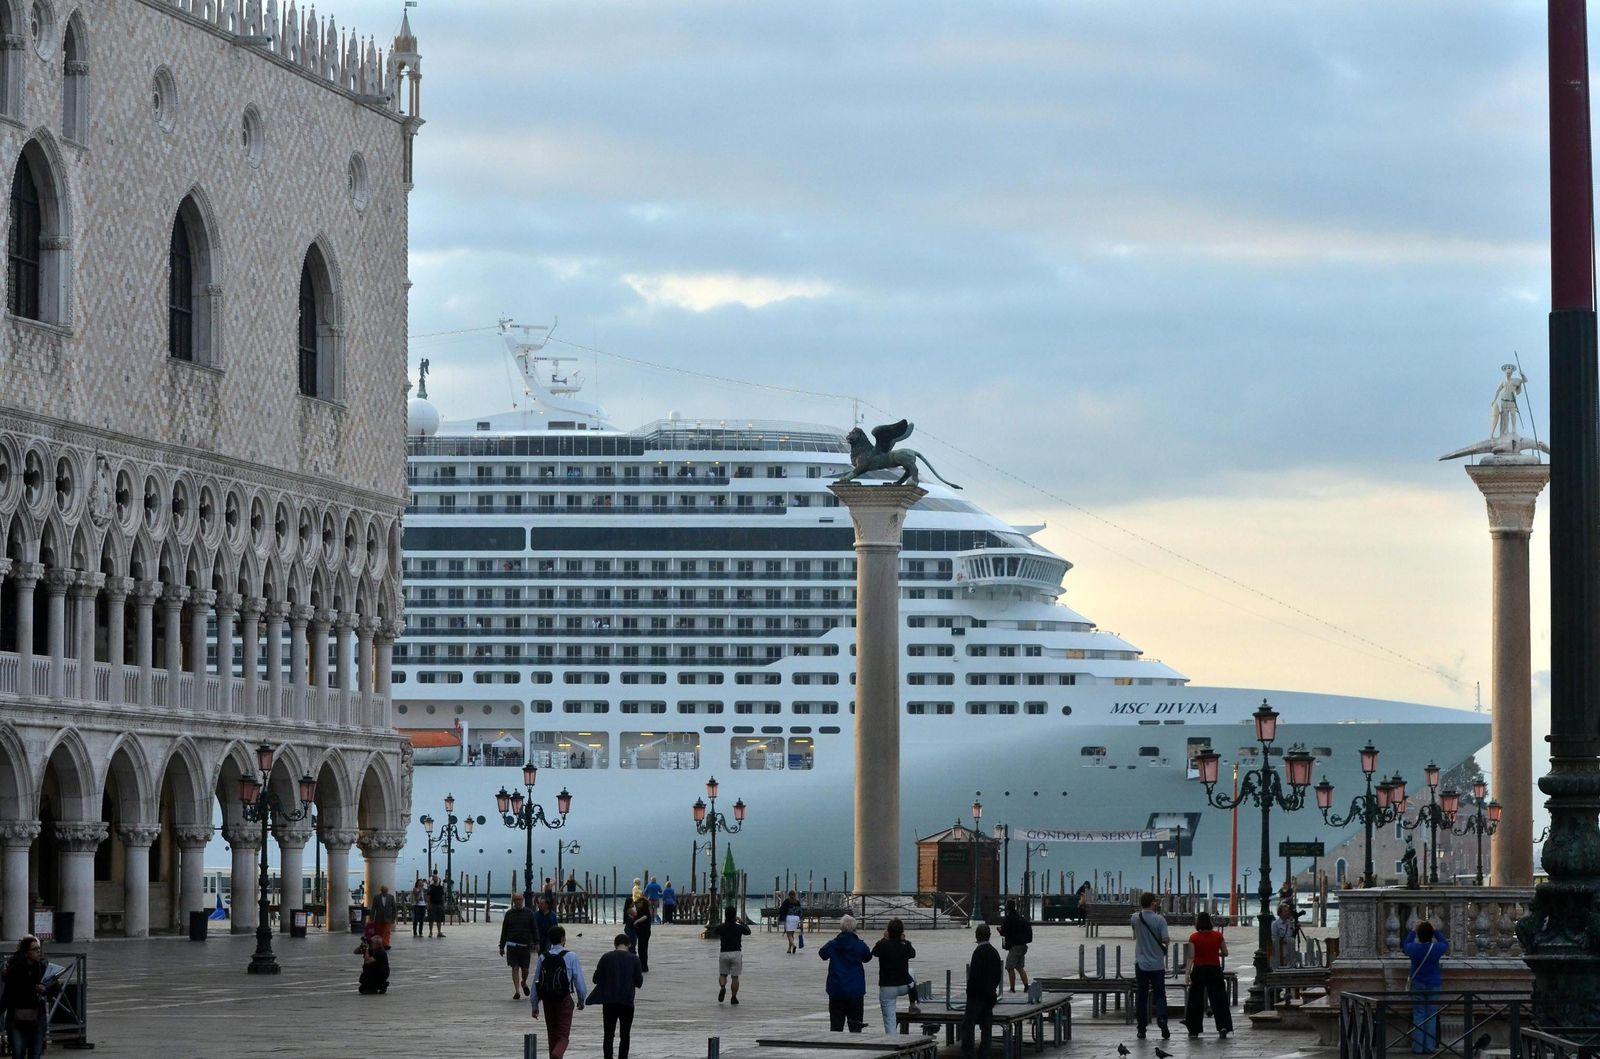 Kreuzfahrt Venedig / Large cruise ships in front San Marco Square